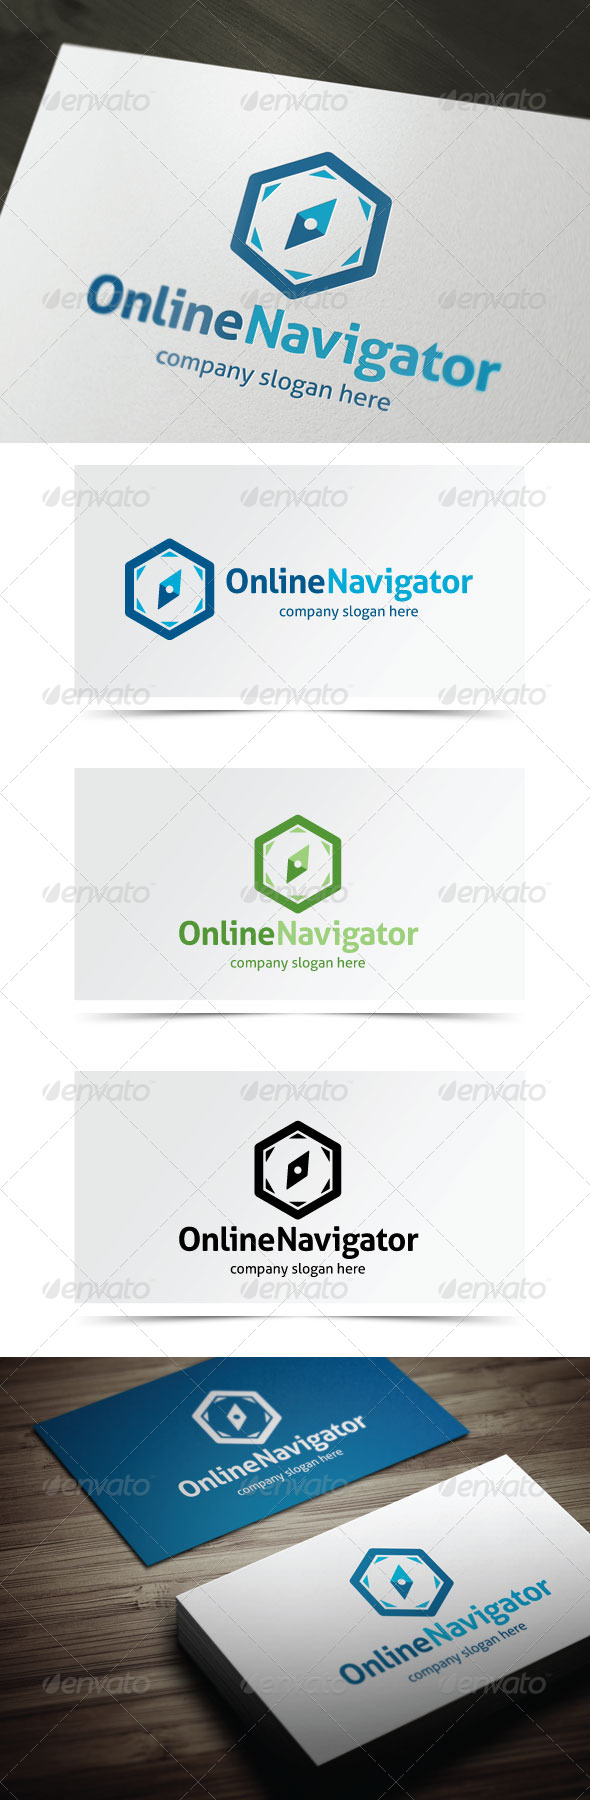 GraphicRiver Online Navigator 5468703